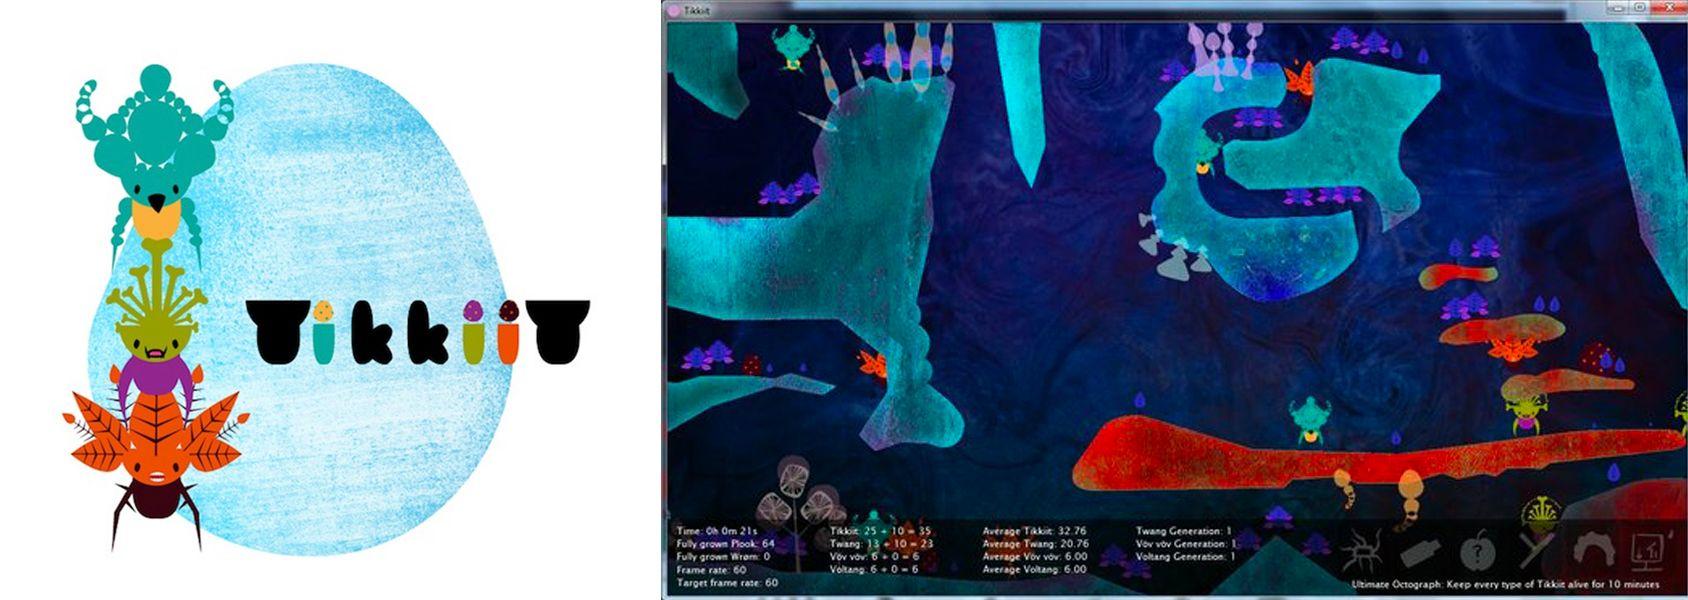 Artwork and screenshot of the game Tikkiit.